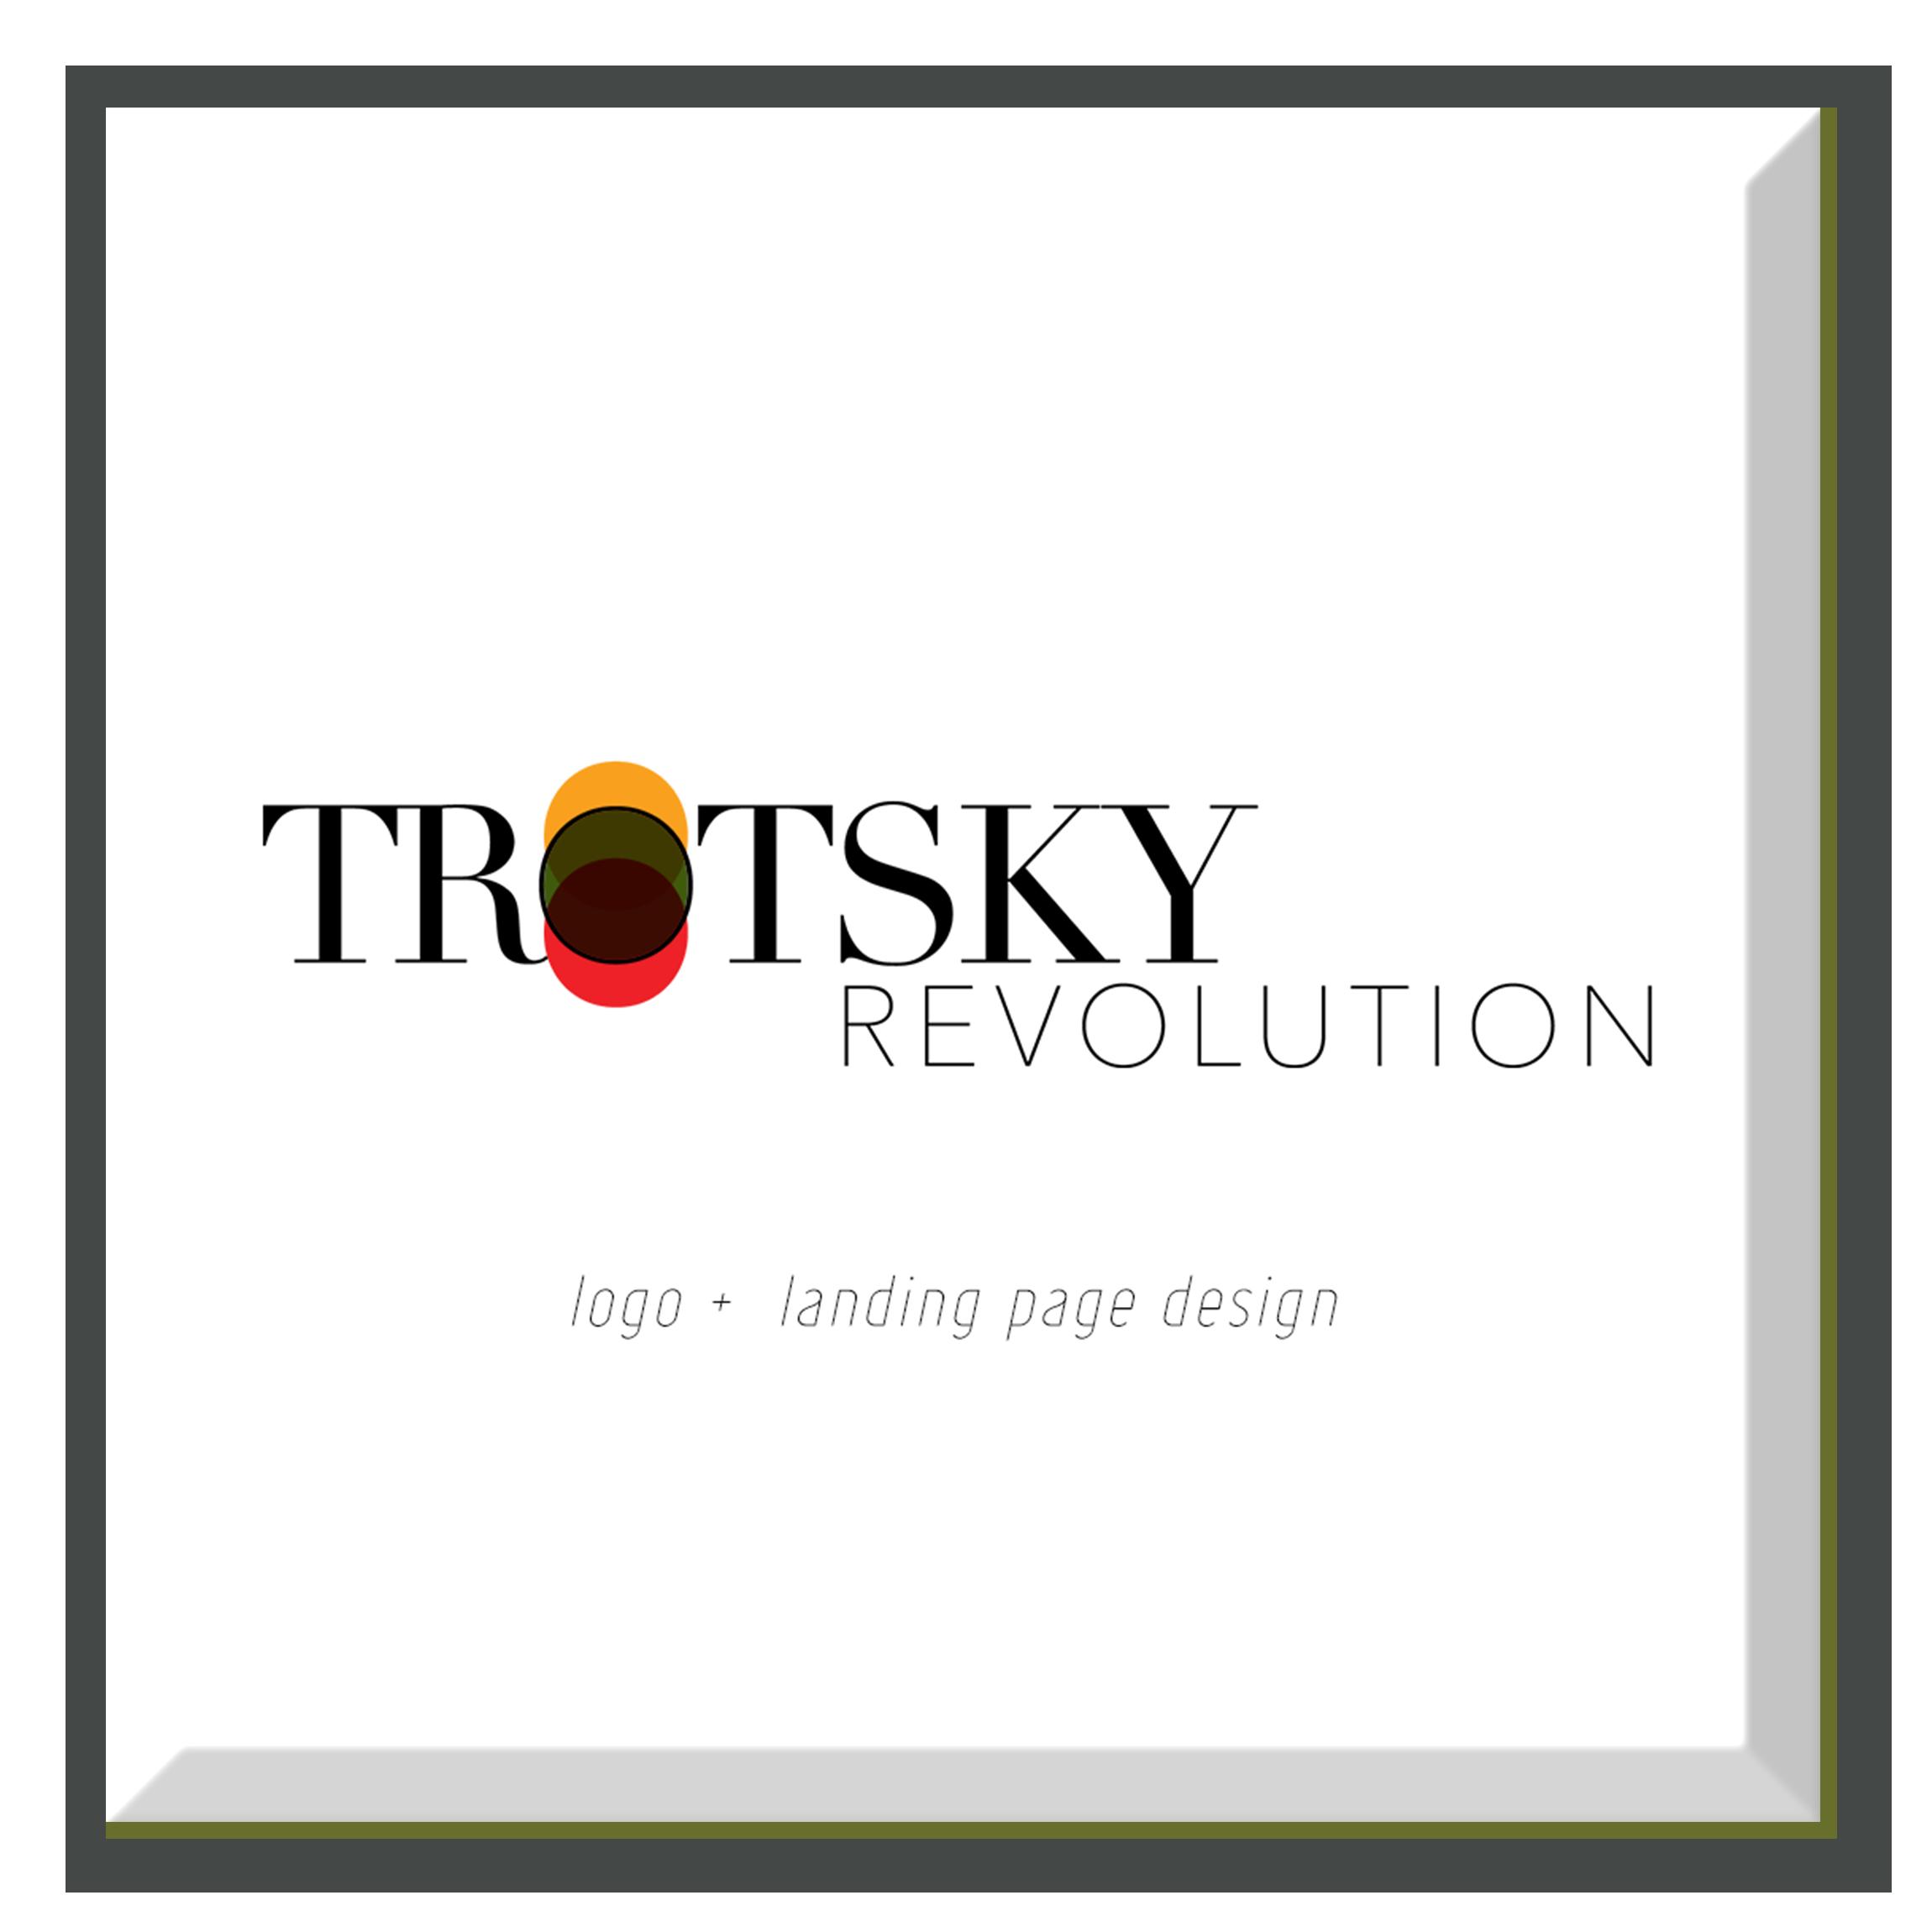 Trotsky_Thumbnail_3D.png